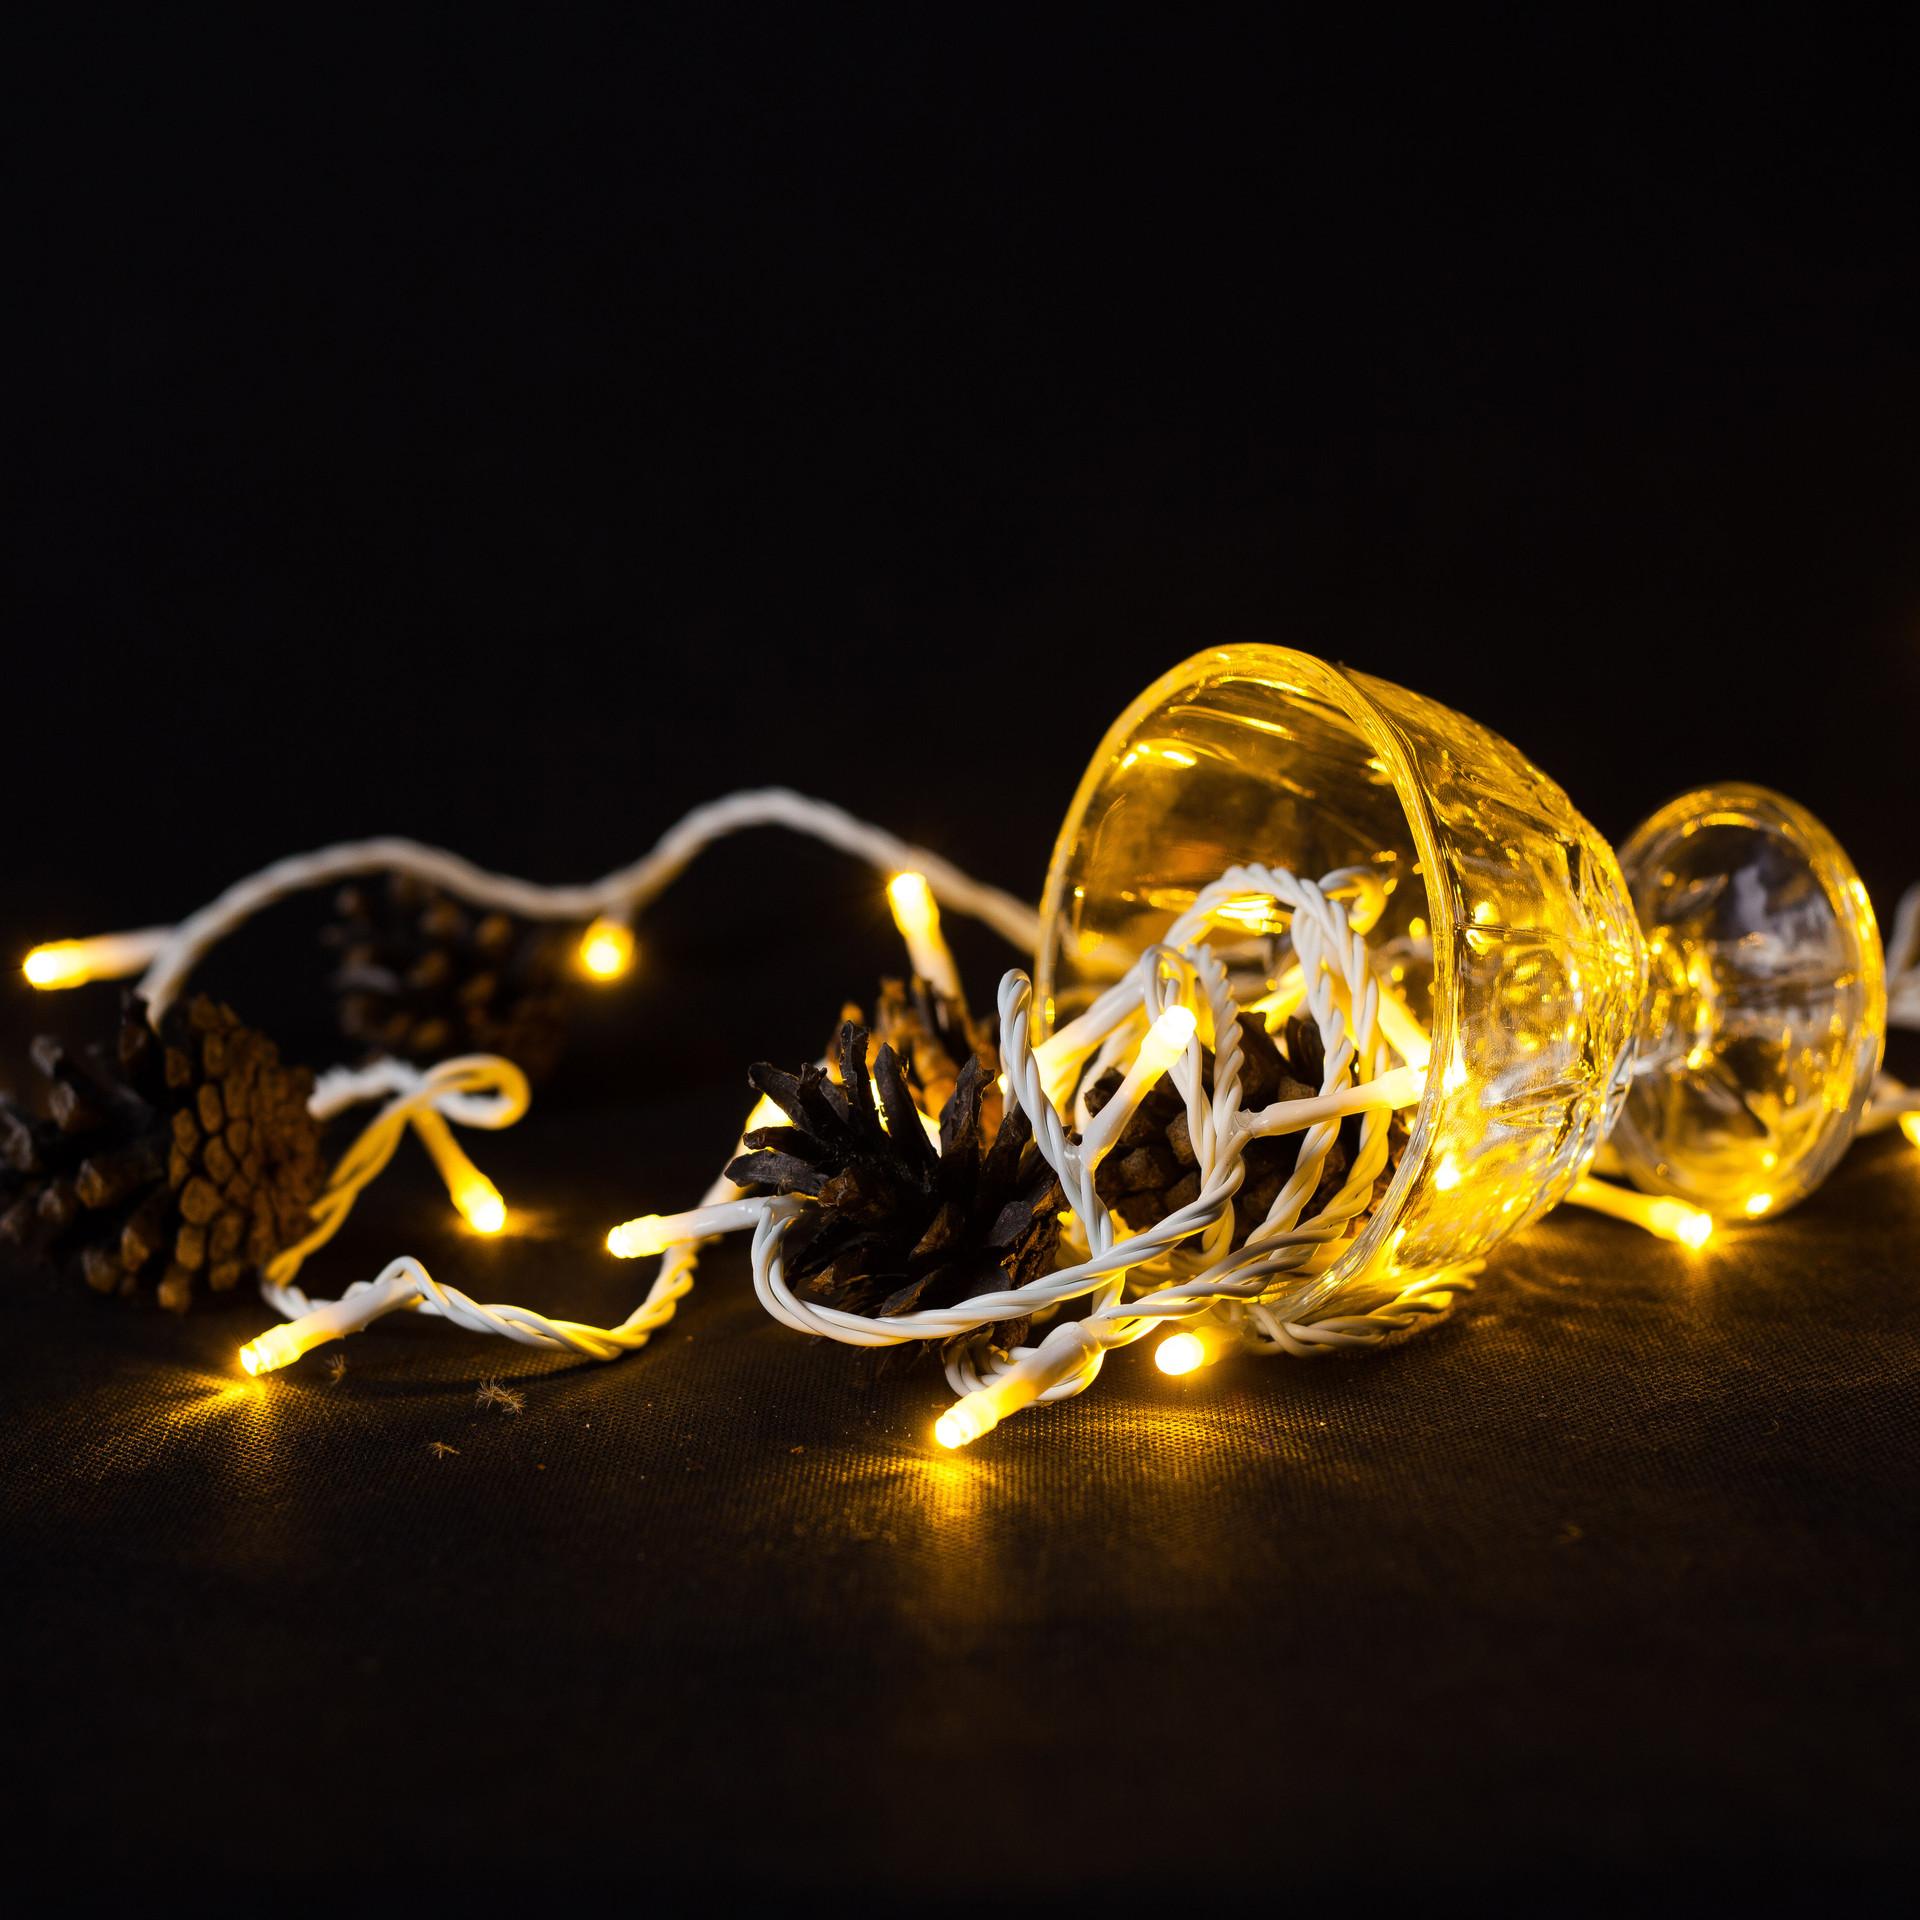 lampki choinkowe led, girlandowo, biały kabel